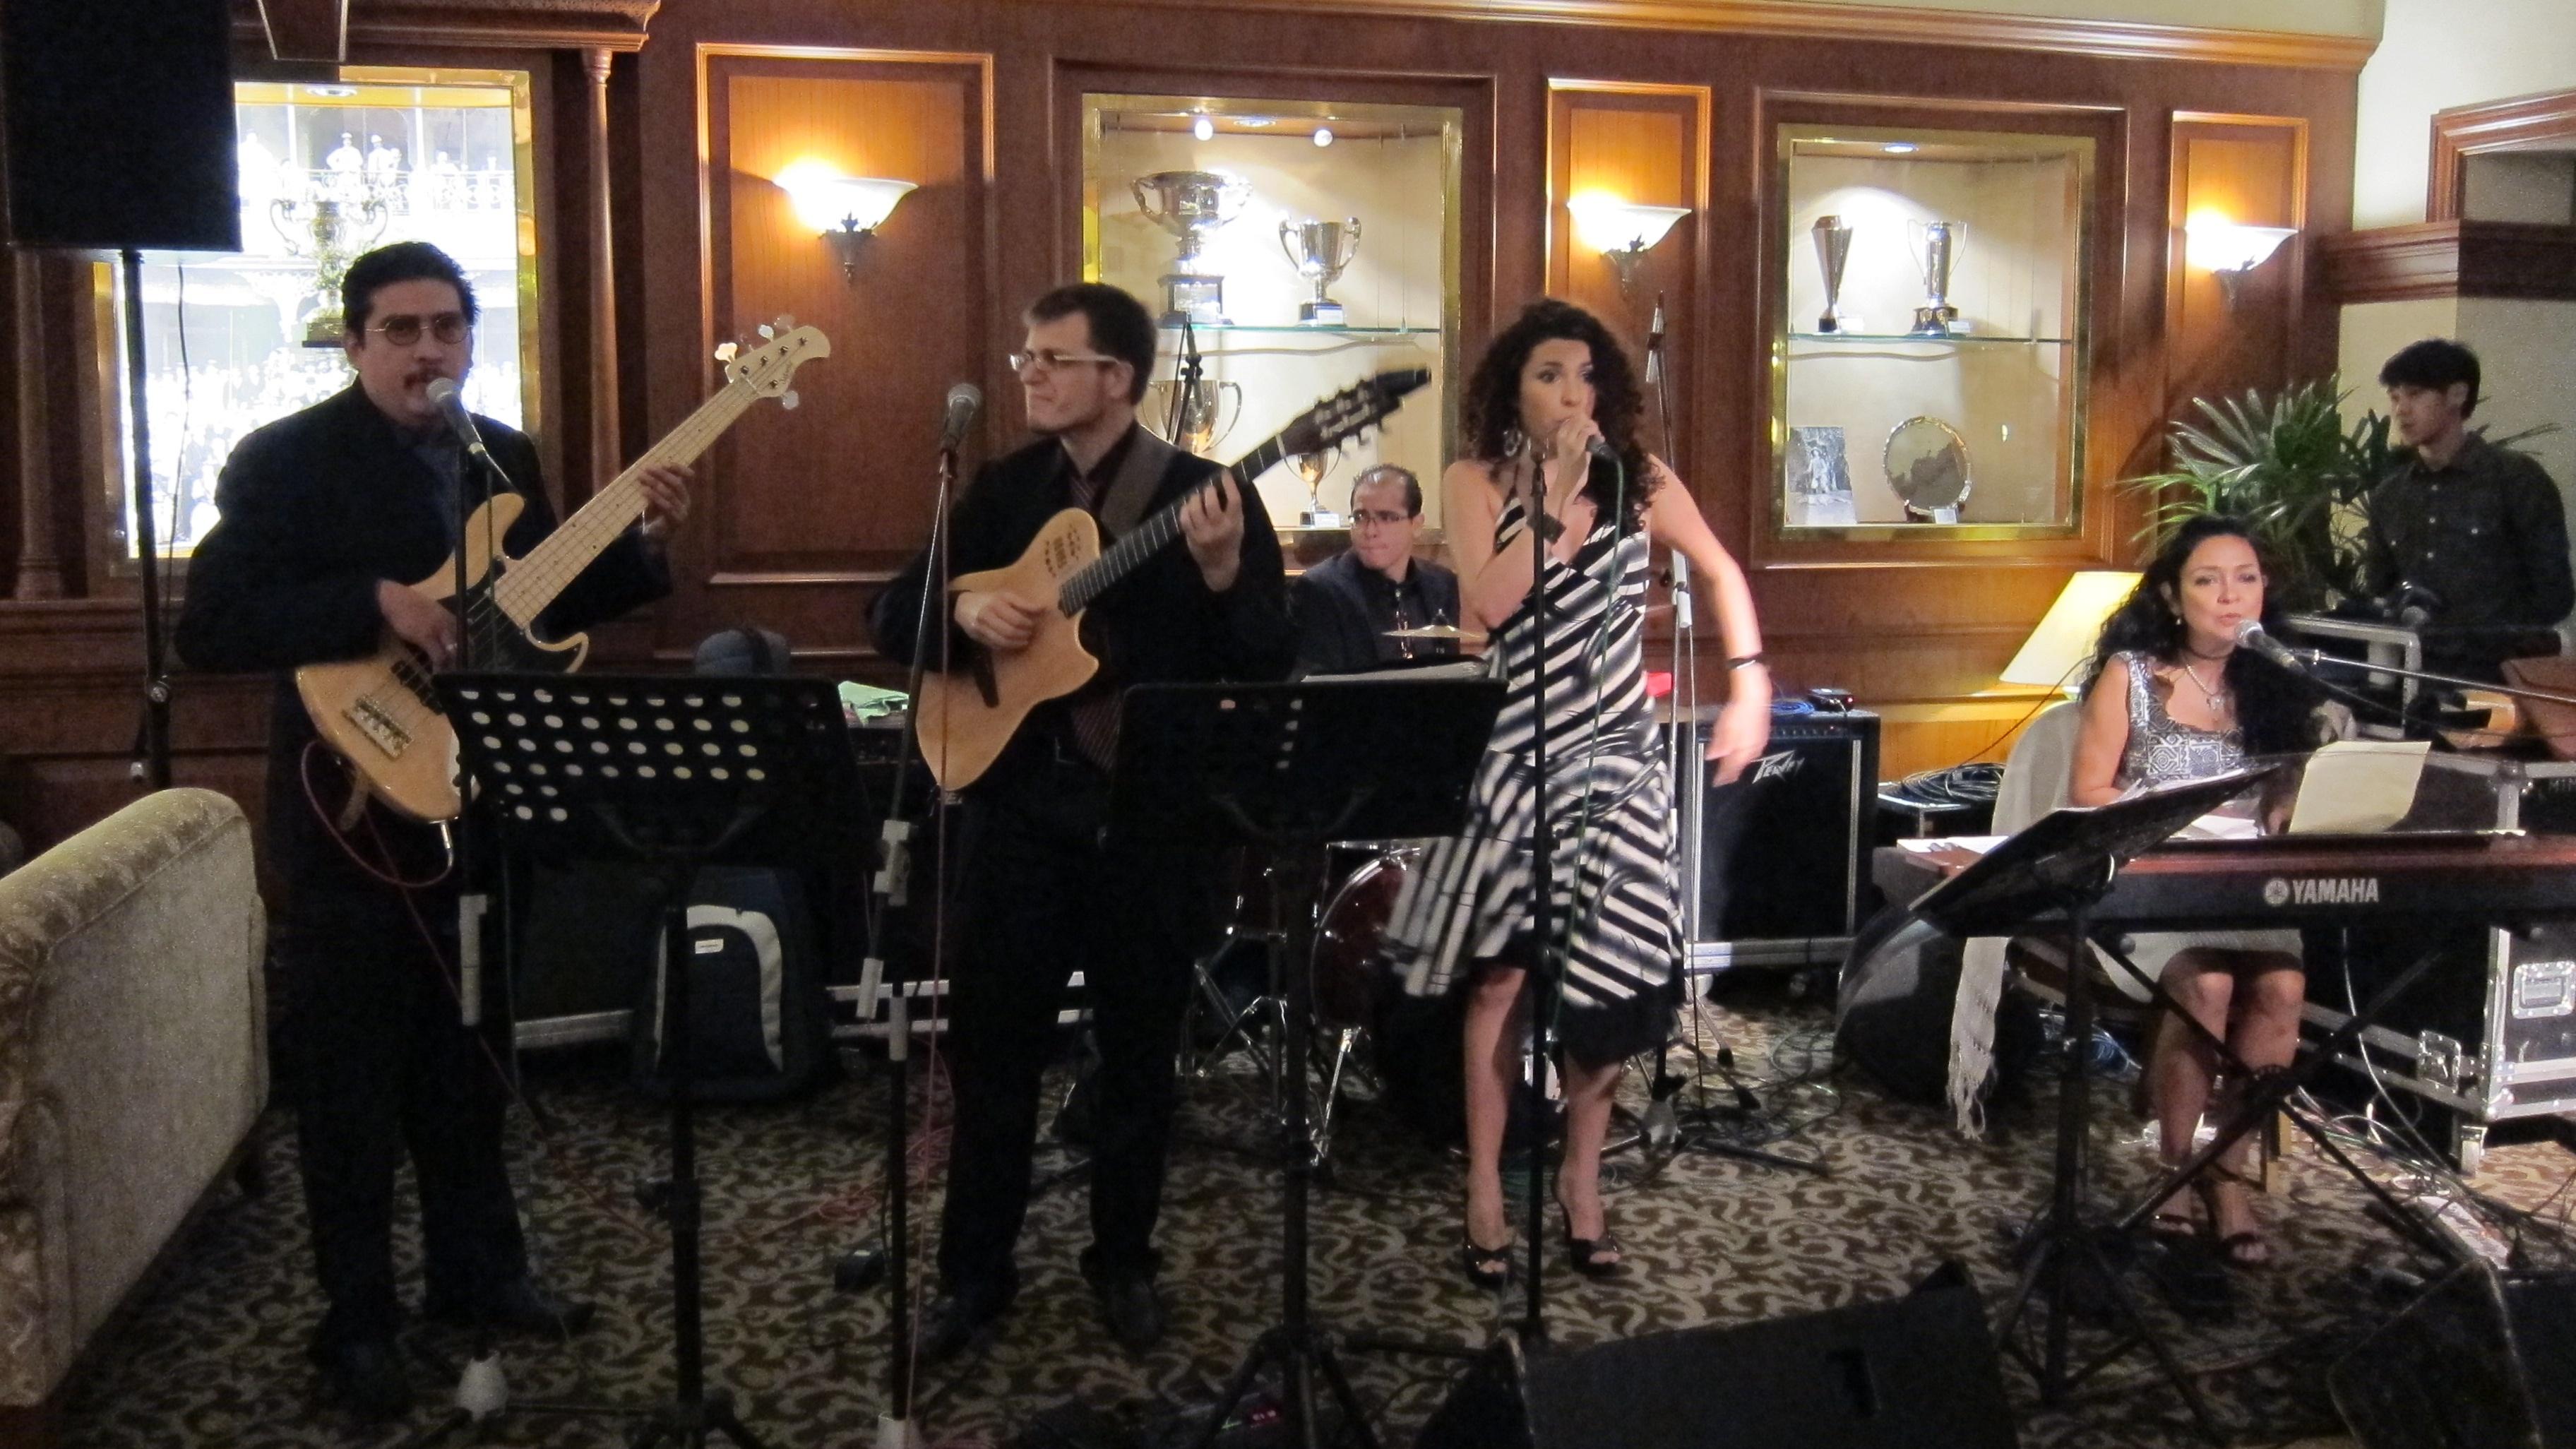 Latin & Salsa Nights with Ireson & friends